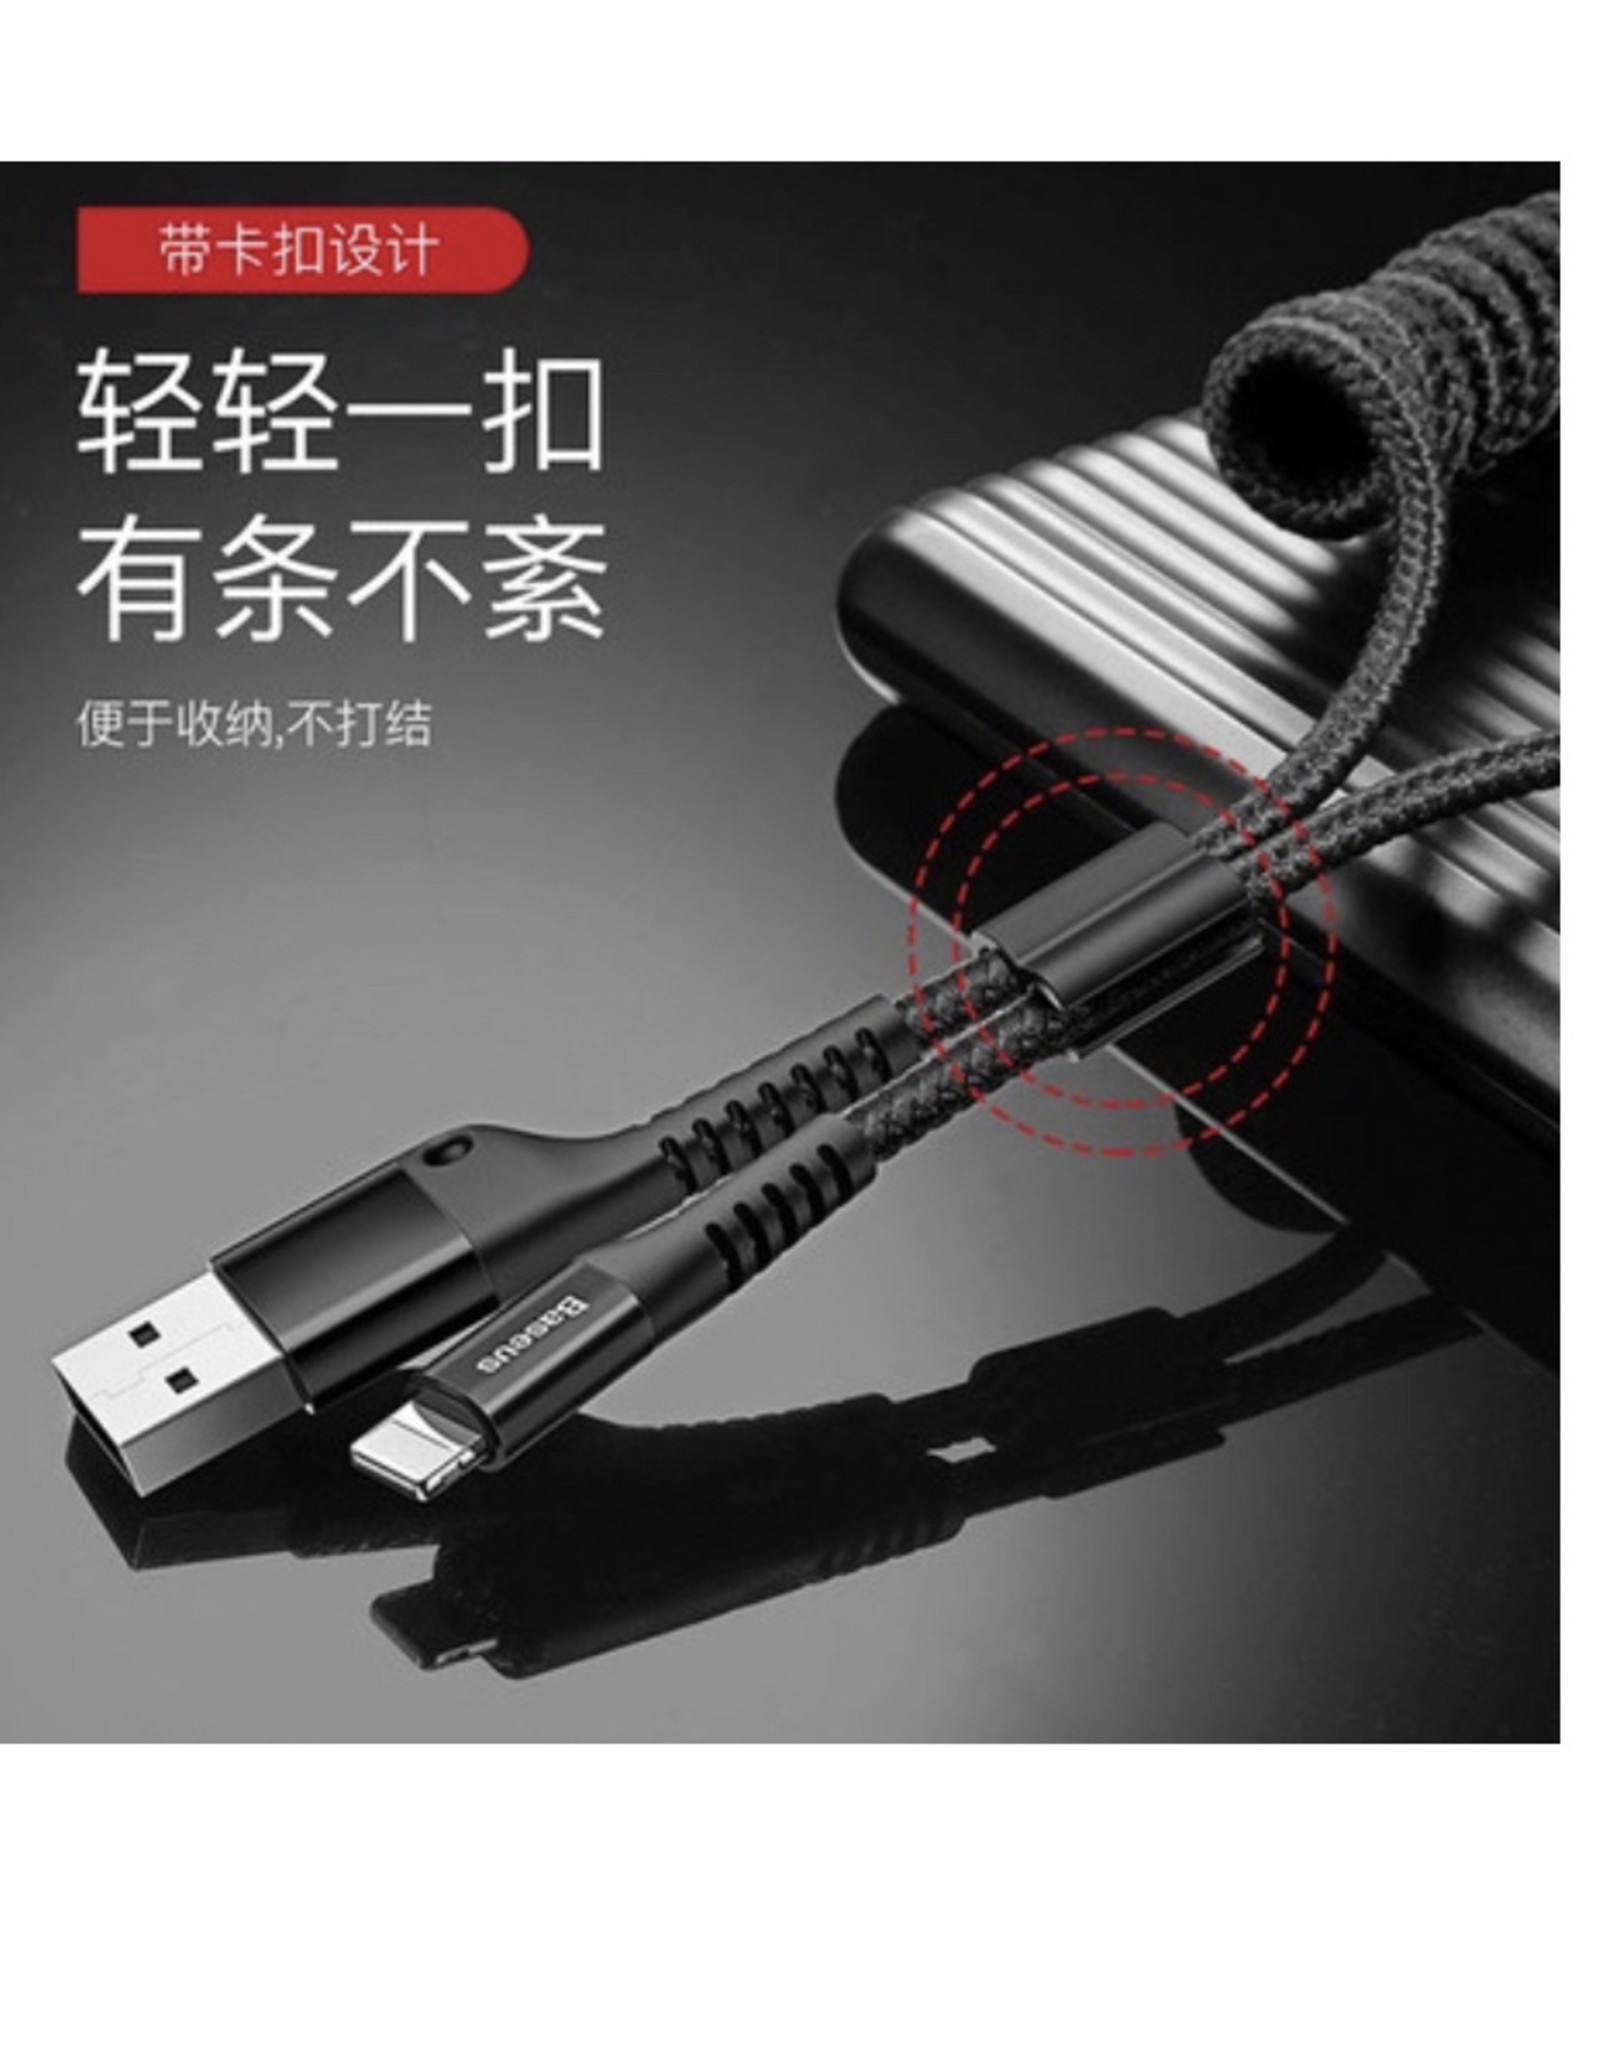 Baseus Baseus Fish Eye Spring Data Cable USB For Type-C 3A 1m Black